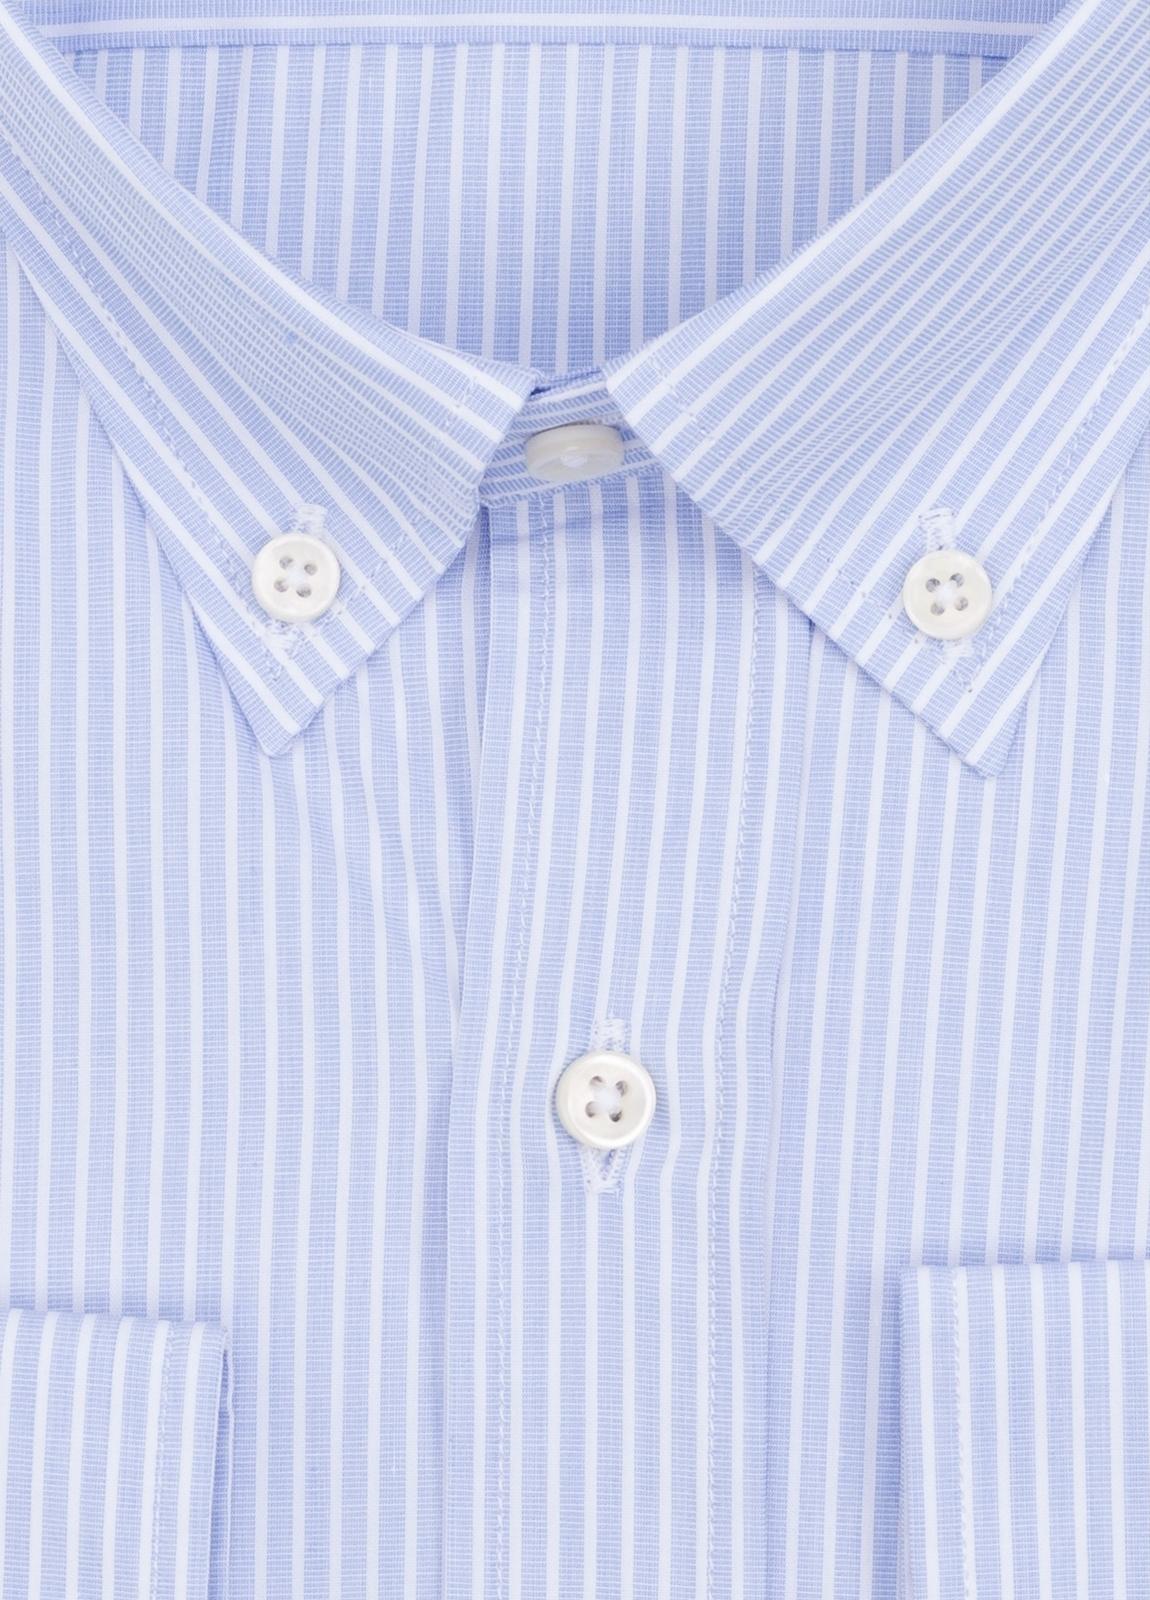 Camisa Formal Wear REGULAR FIT modelo BOTTON DOWN con diseño de rayas color azul. 100% Algodón. - Ítem1